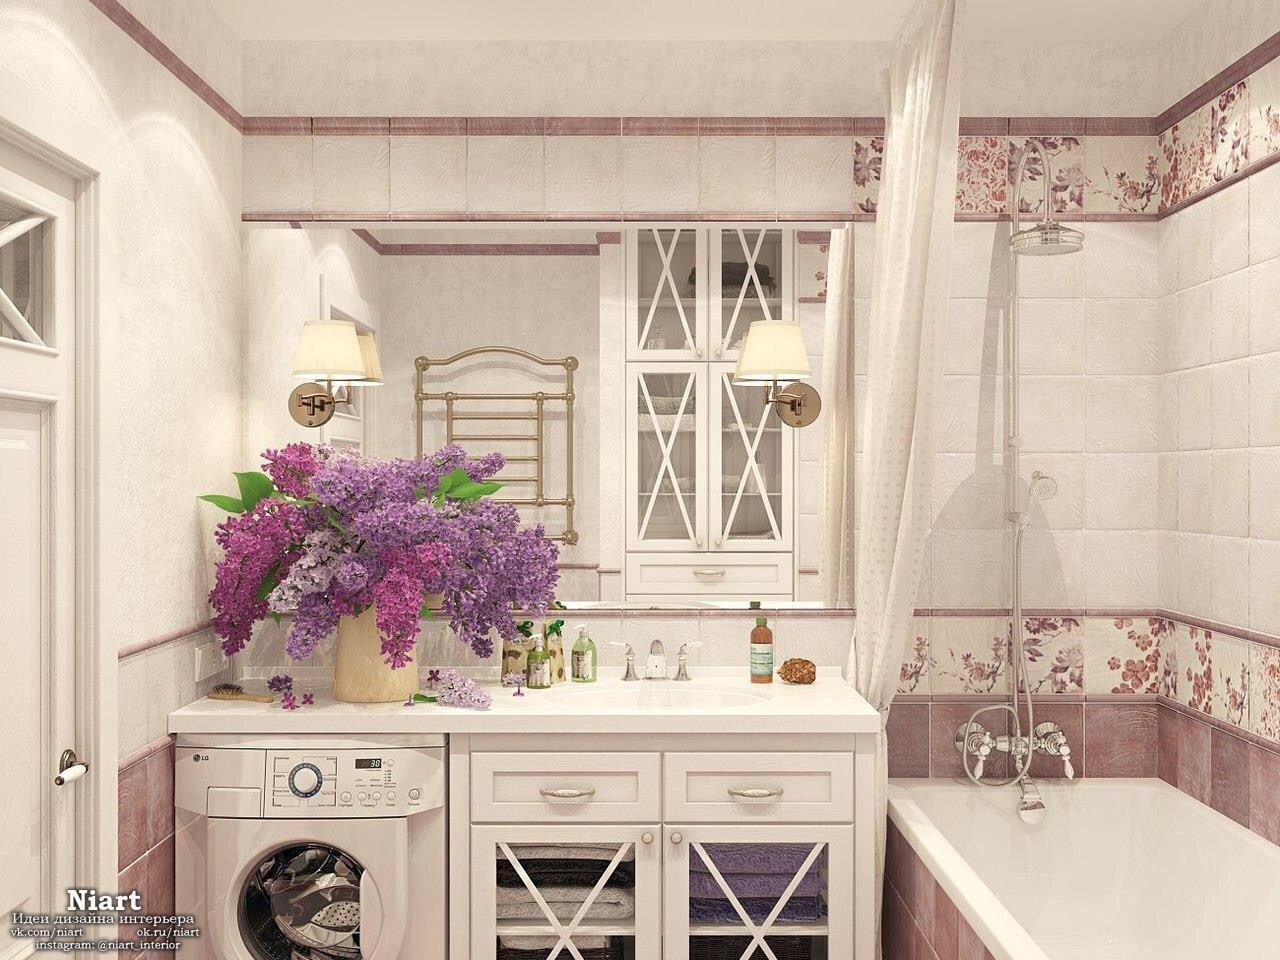 Pin by Anastasia Dudina on Provence Interior Design | Pinterest ...